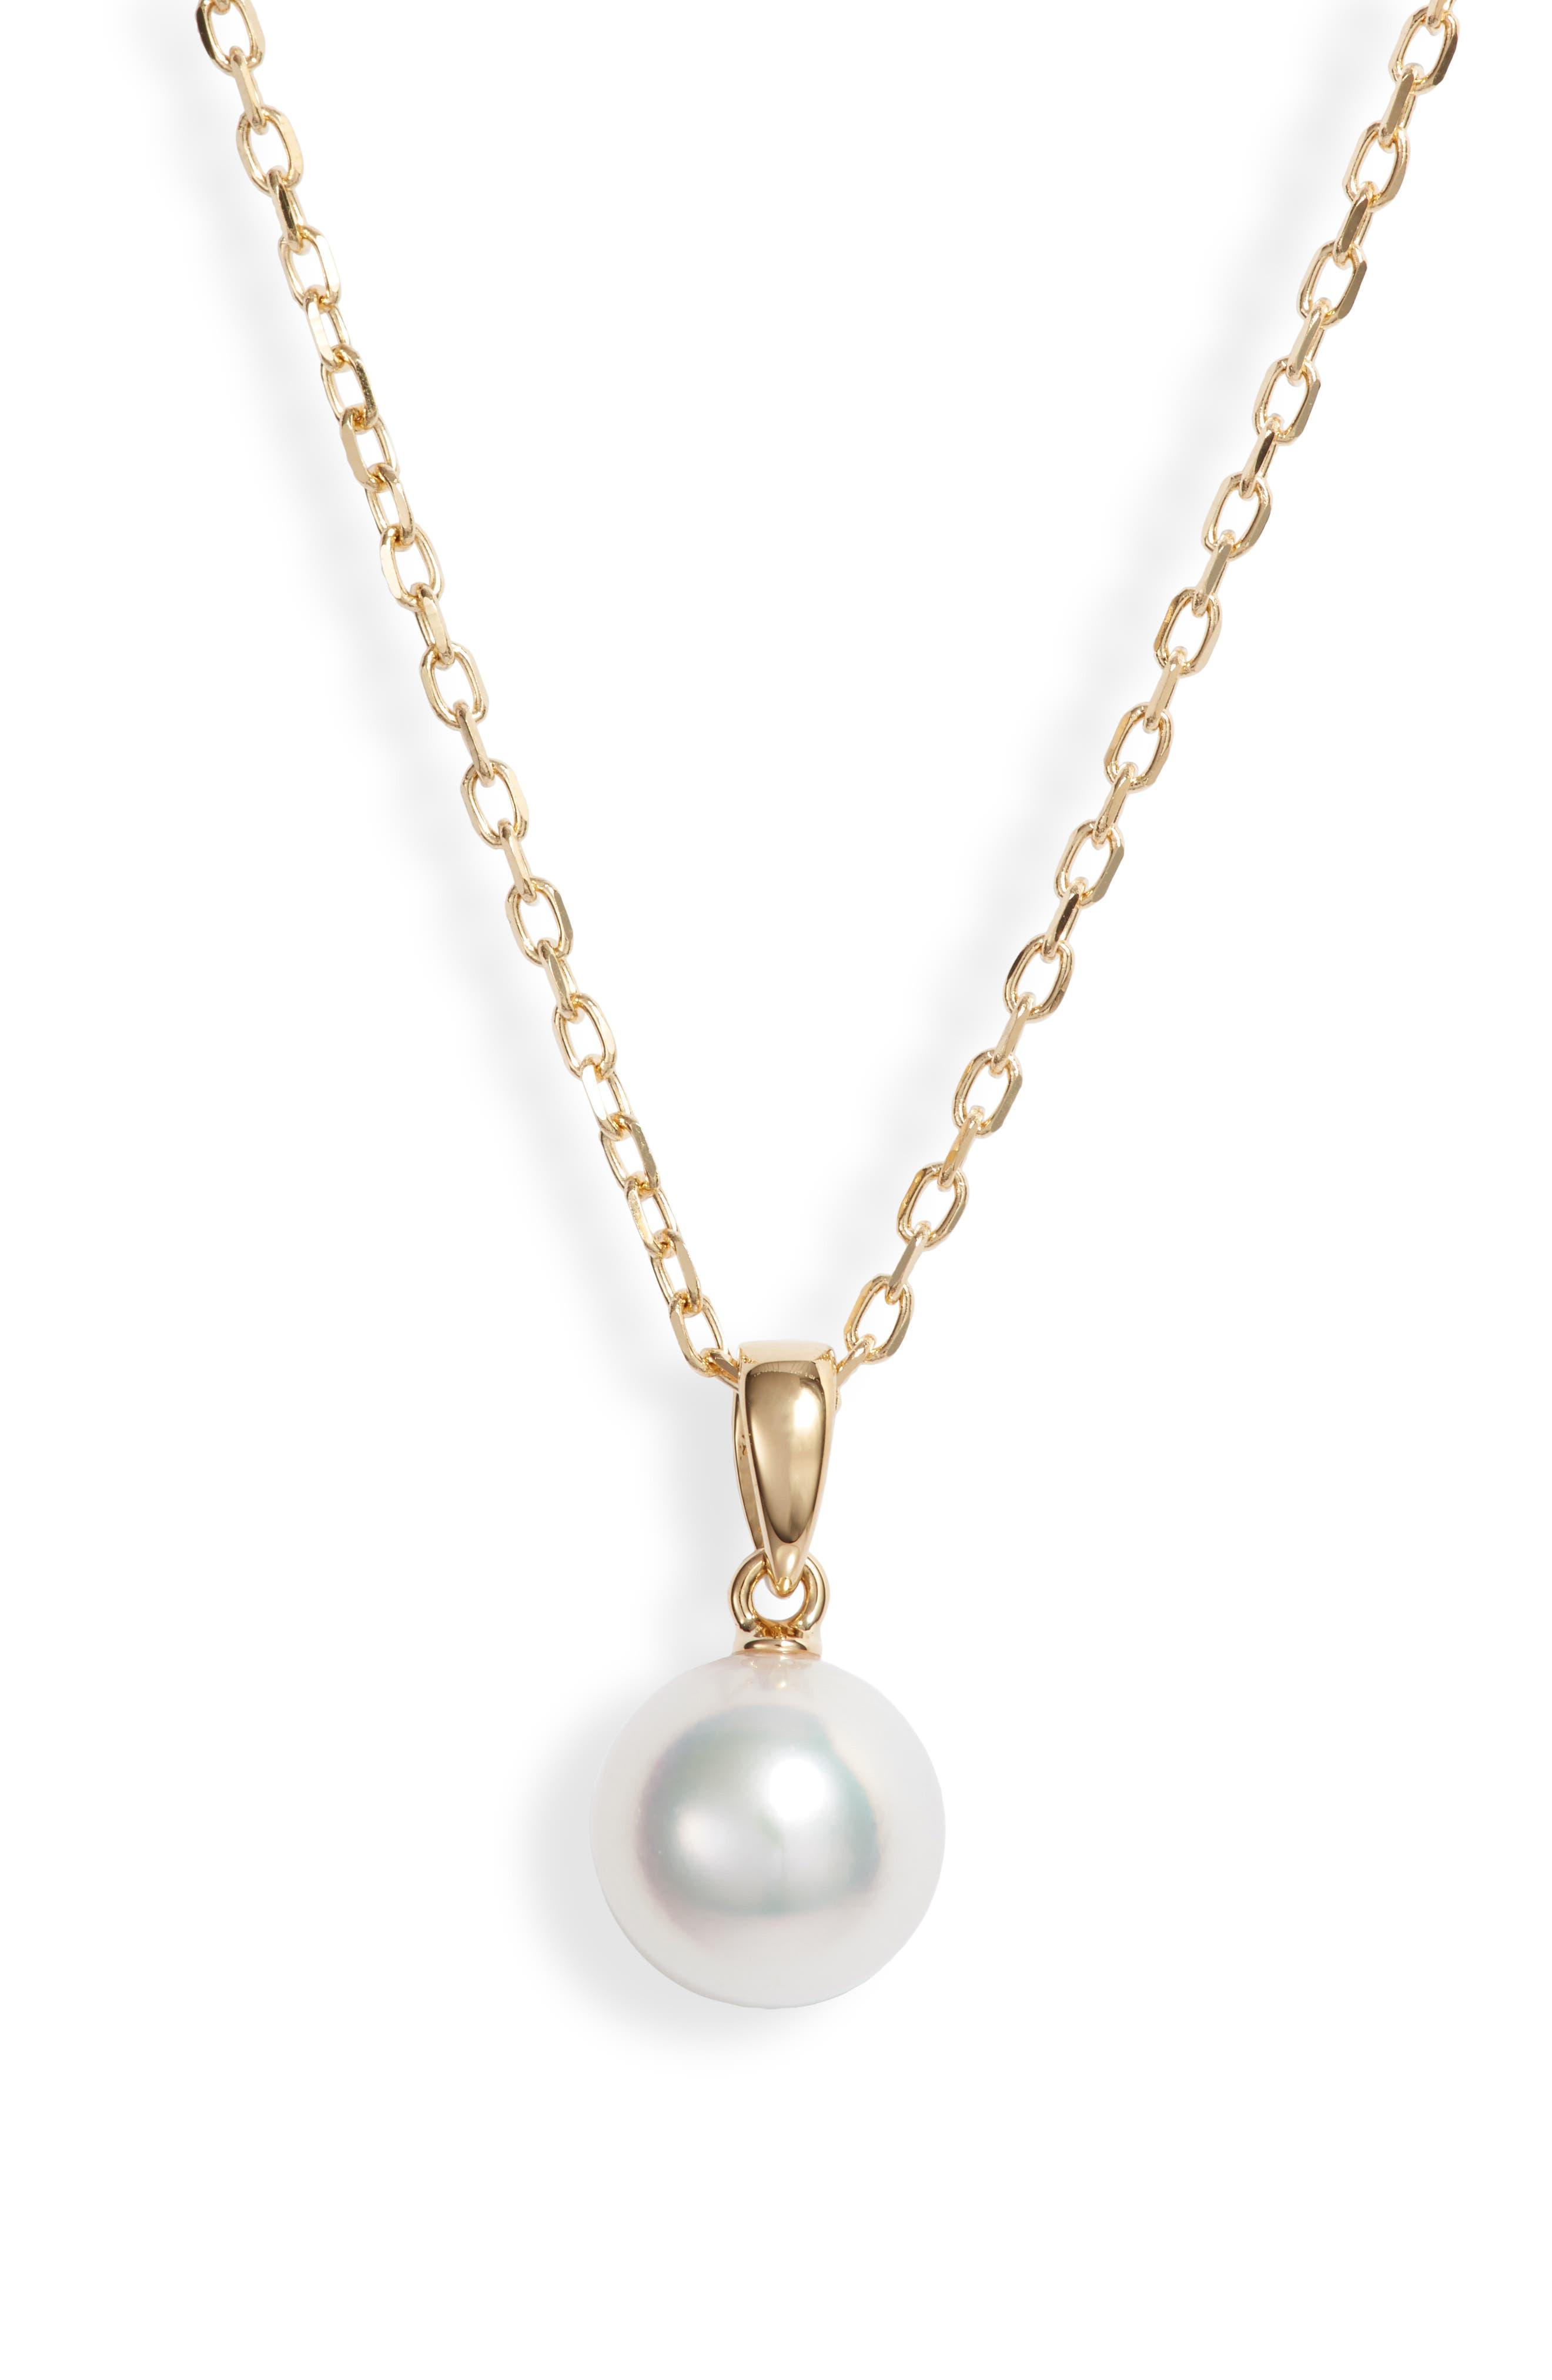 Essential Elements Pearl Pendant Necklace